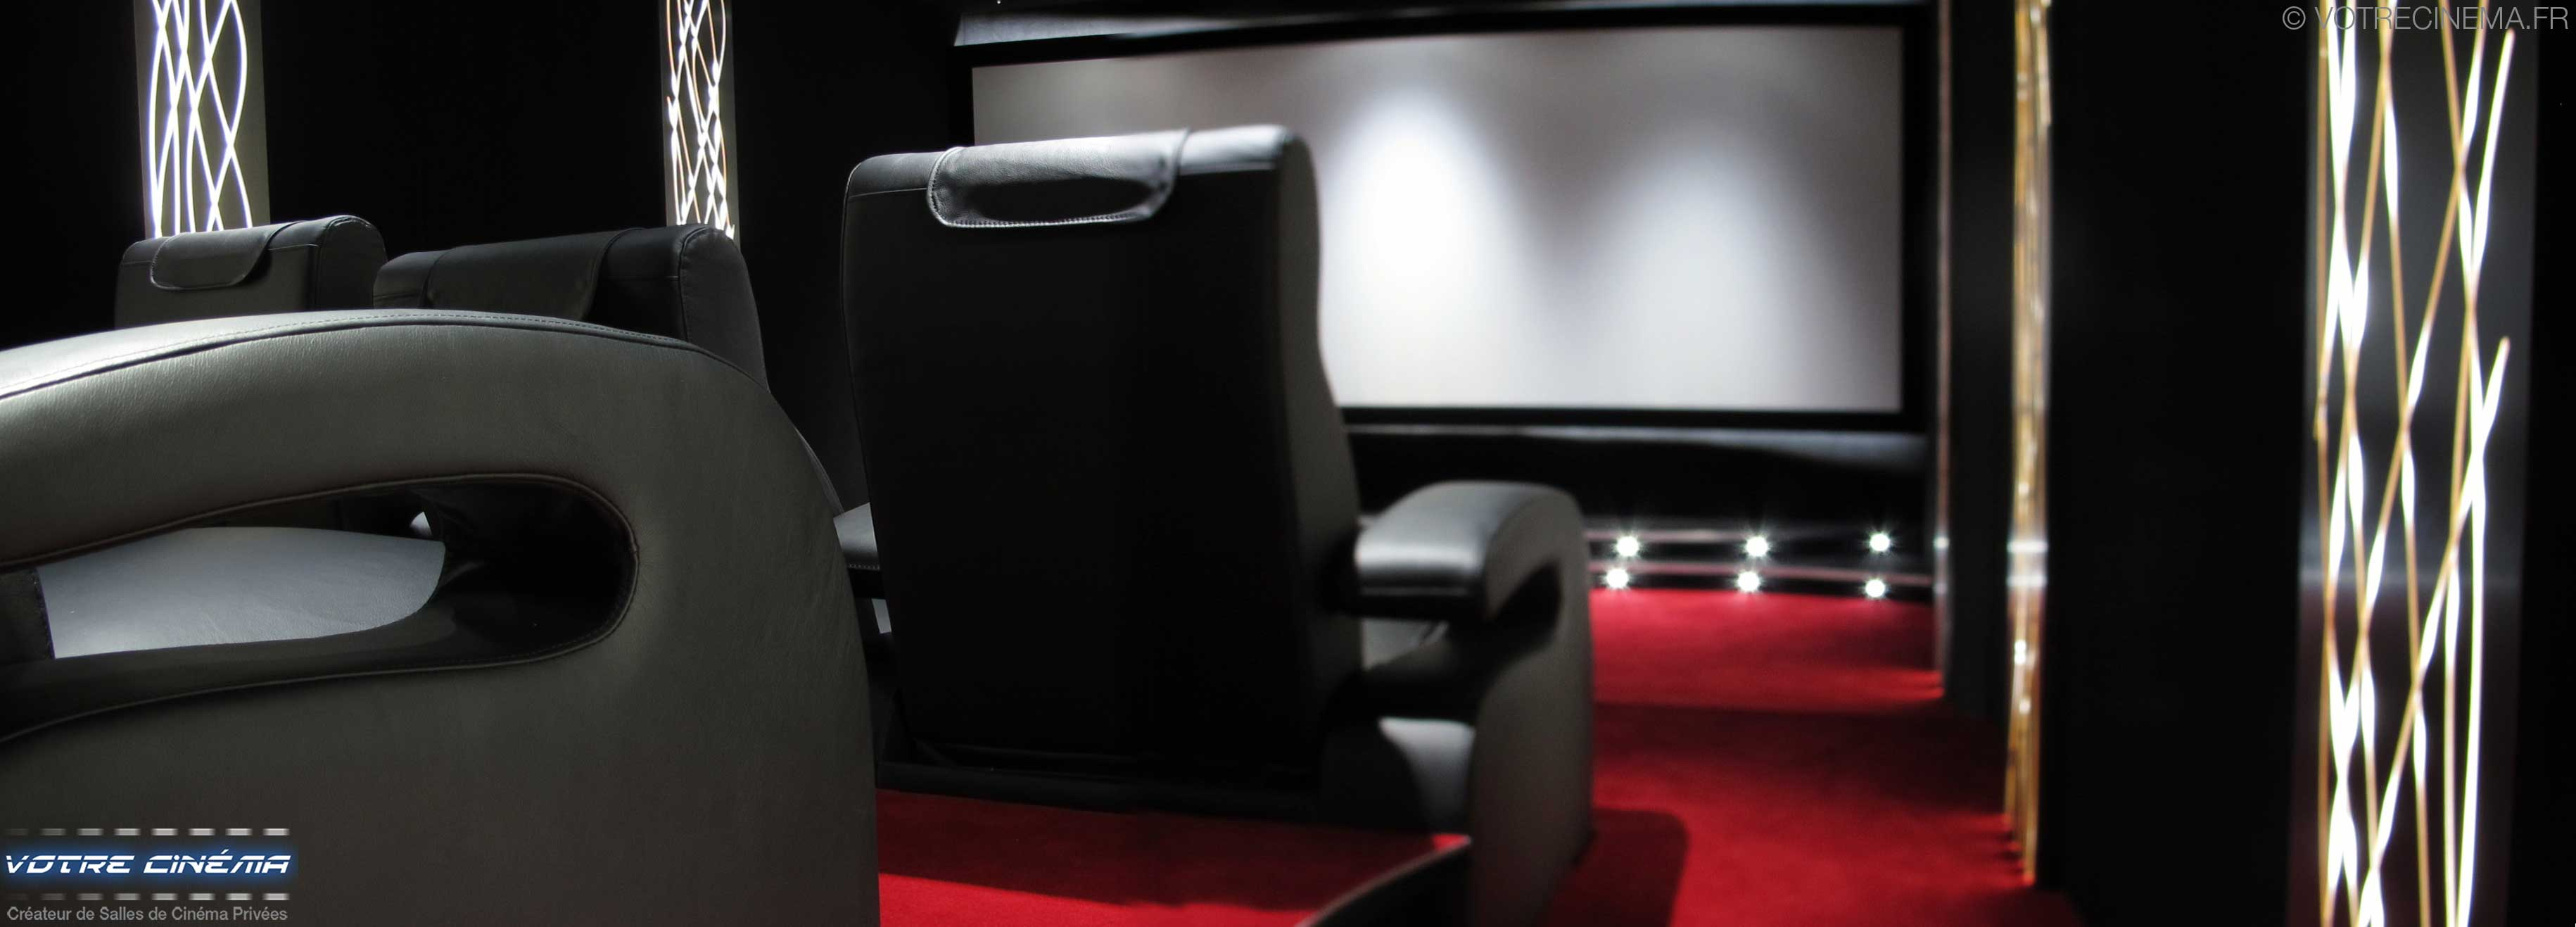 Home cinéma privé Valence